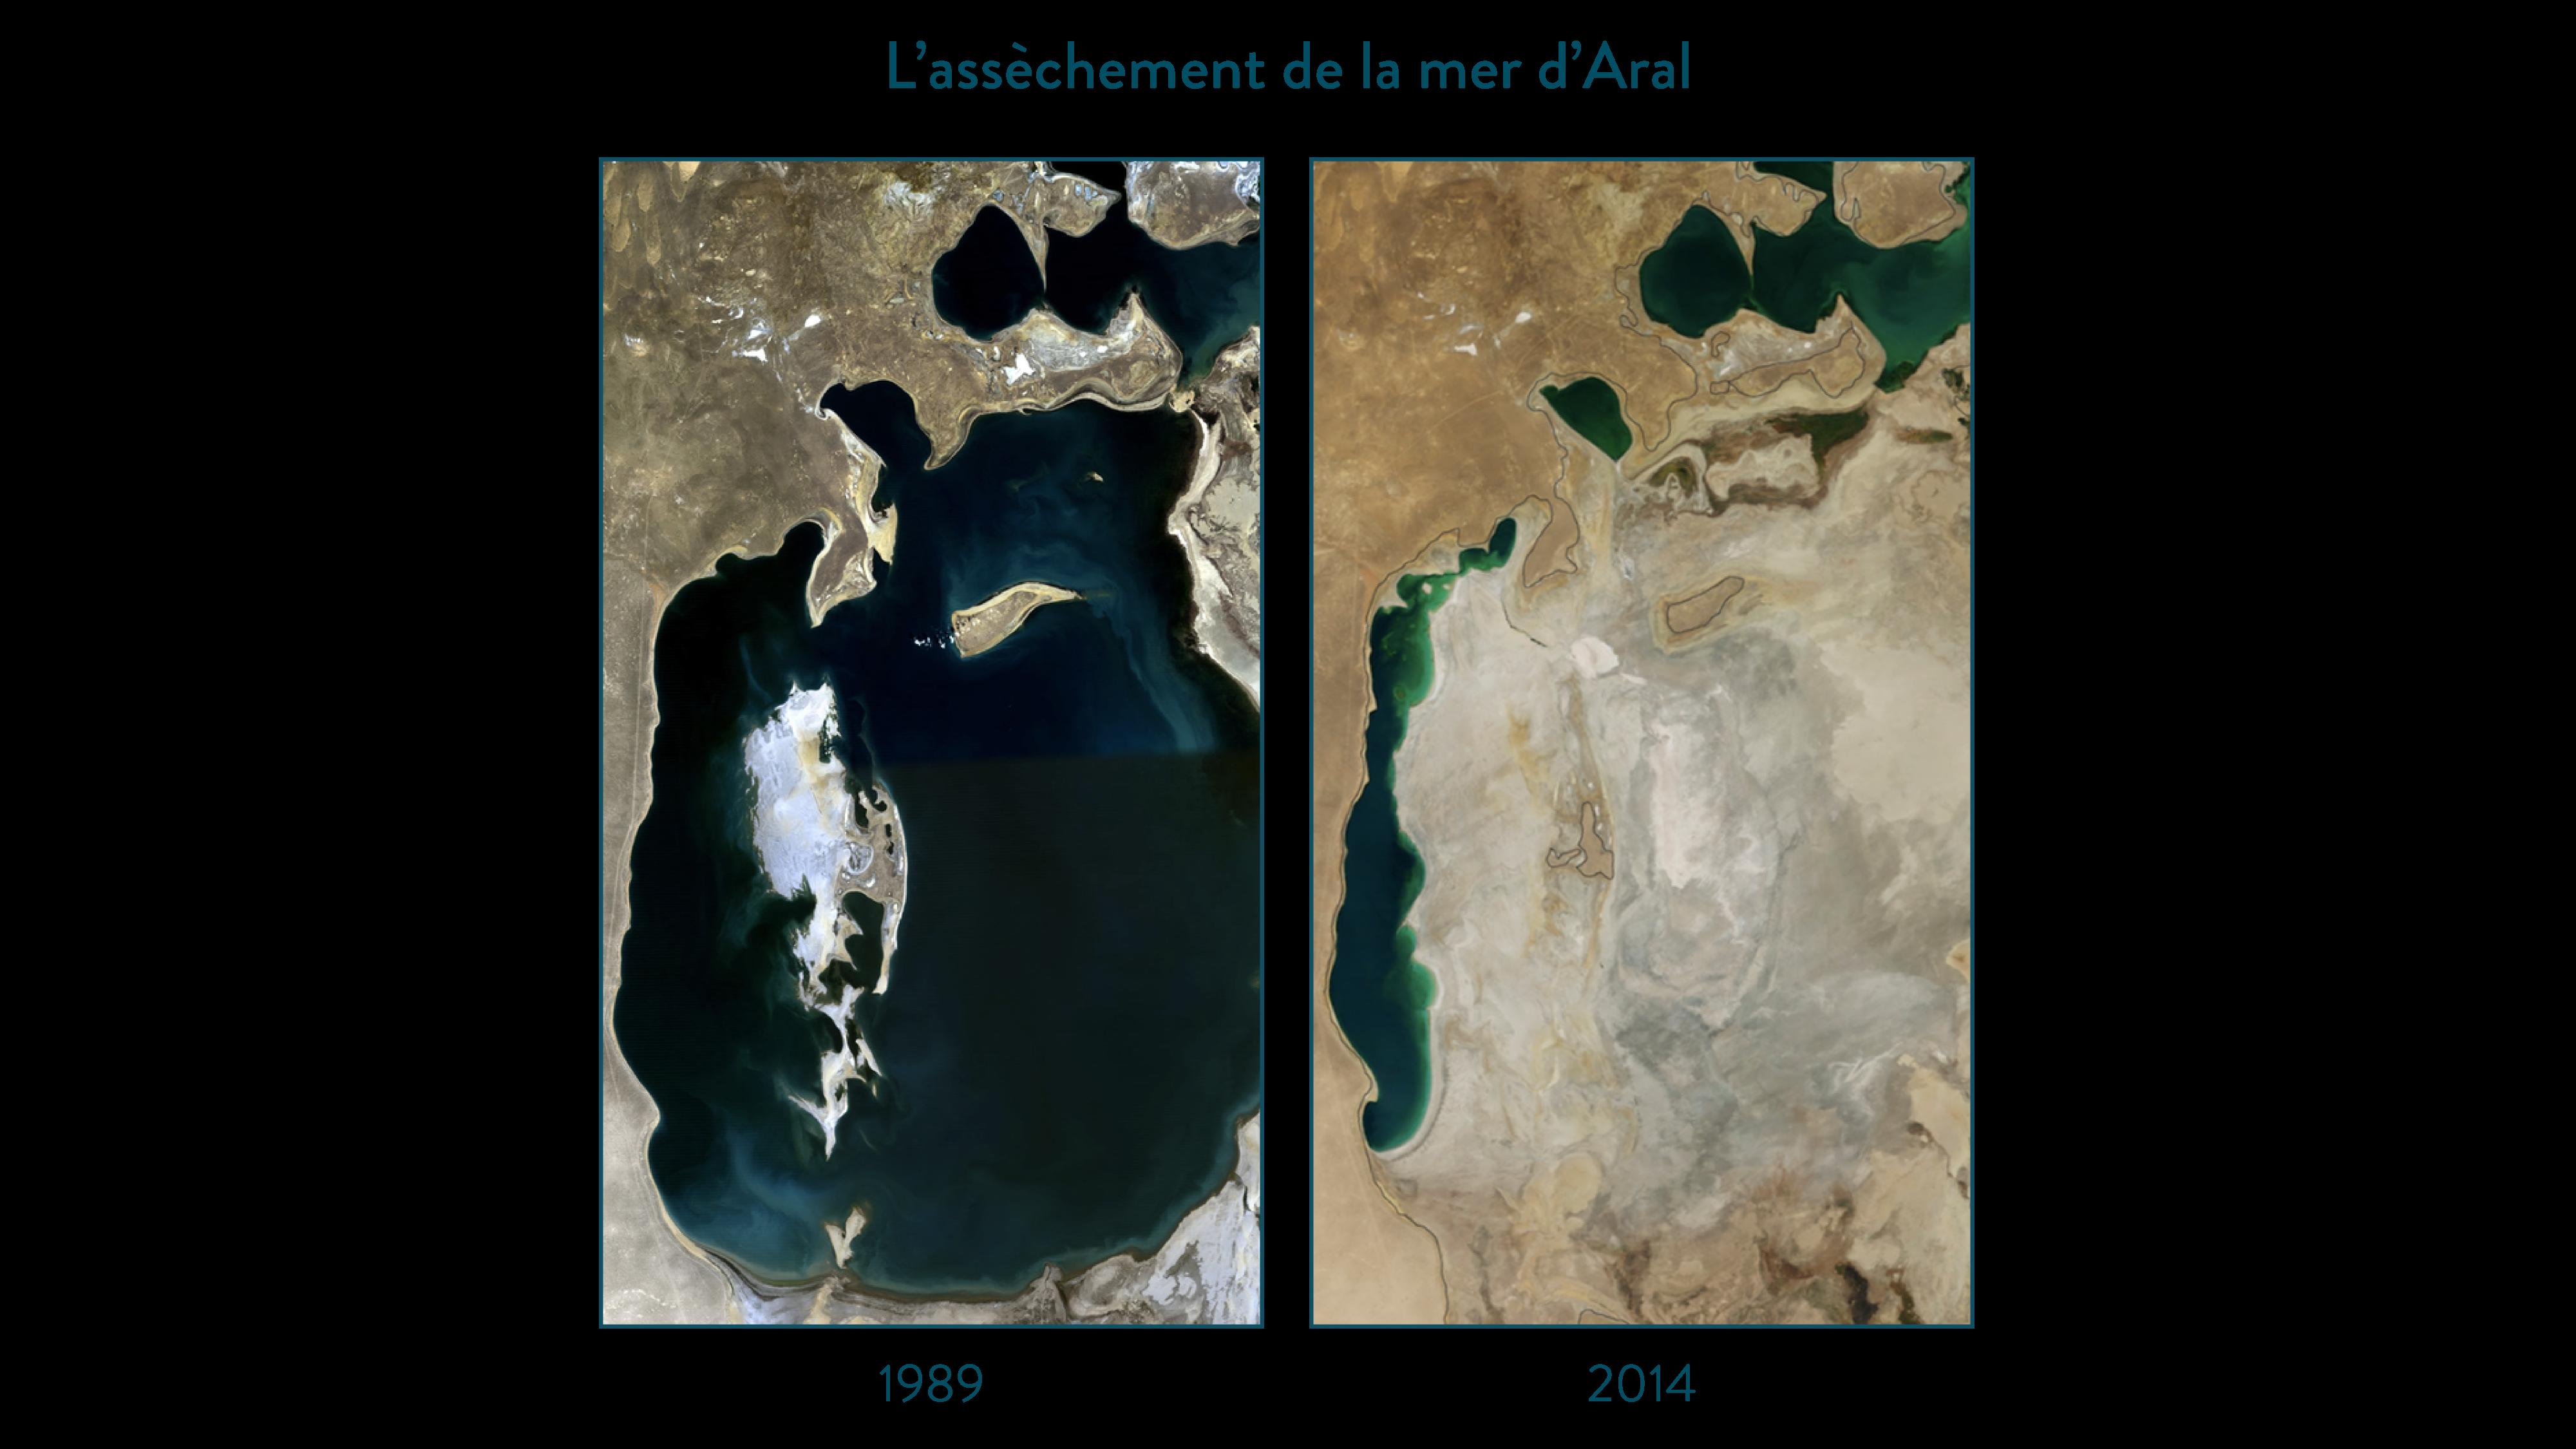 L'assèchement de la mer d'Aral